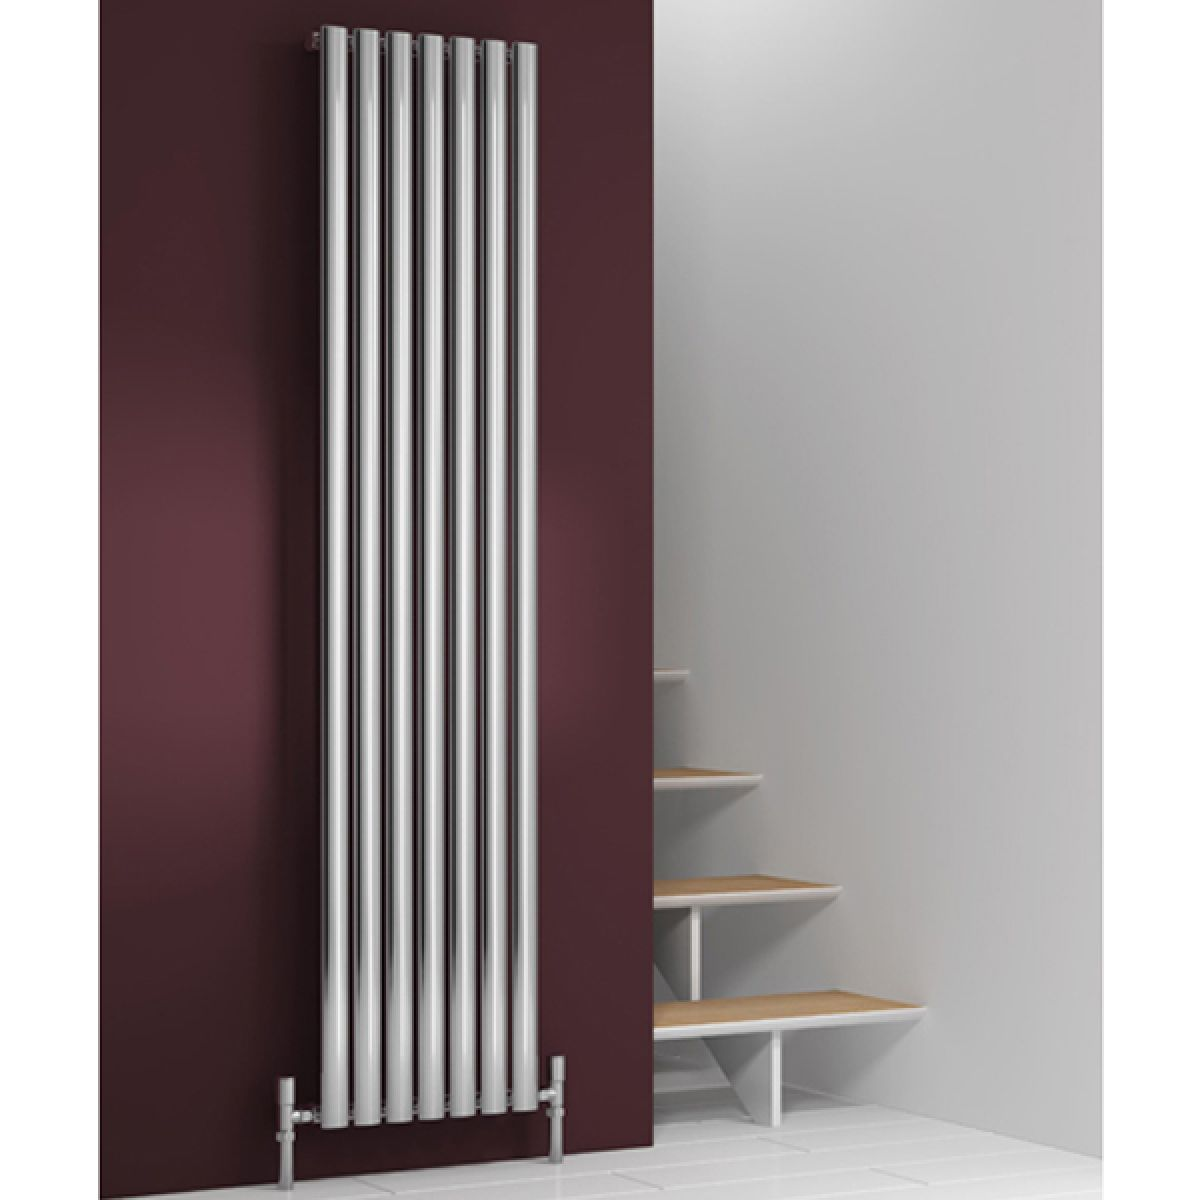 Reina Nerox Single Polished Stainless Steel Designer Column Radiator